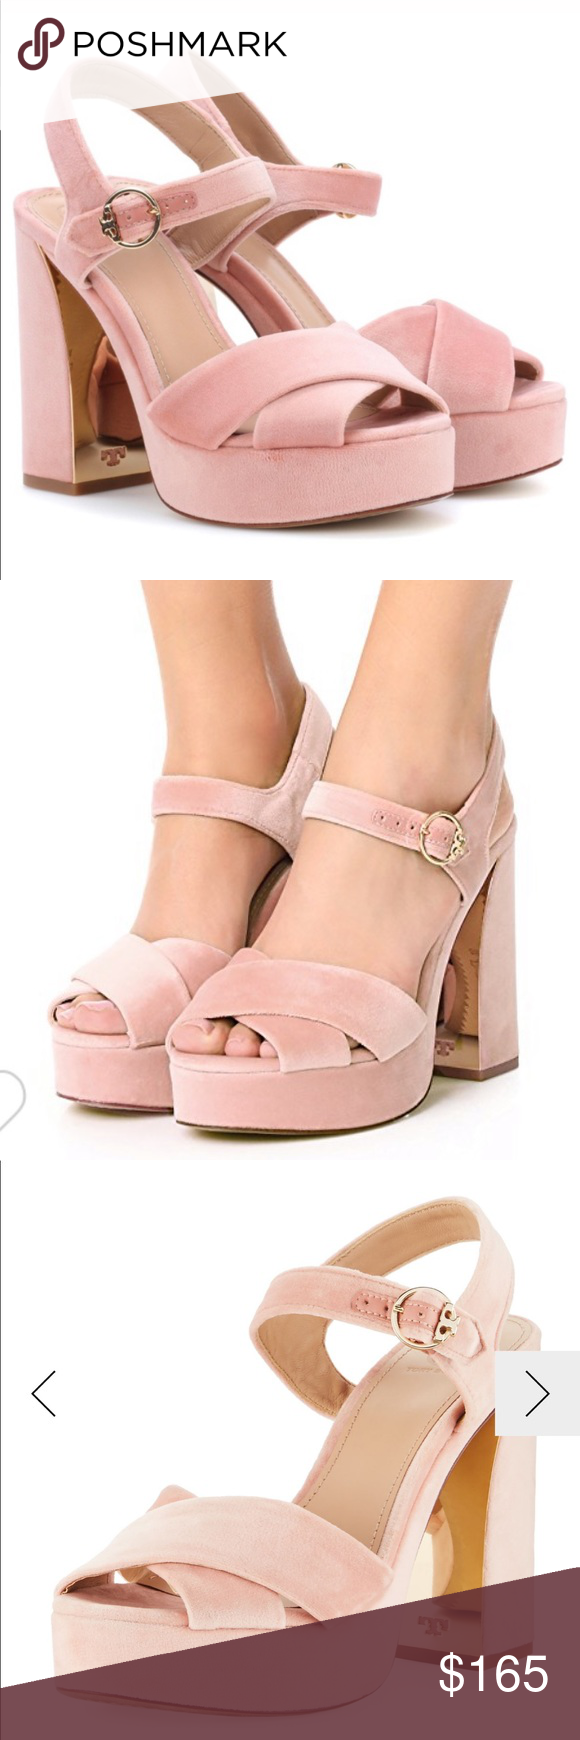 60d295161f9500 Tory Burch Loretta Velvet Platform Sandal Pink 7.5 Loretta Velvet Platform  Sandal